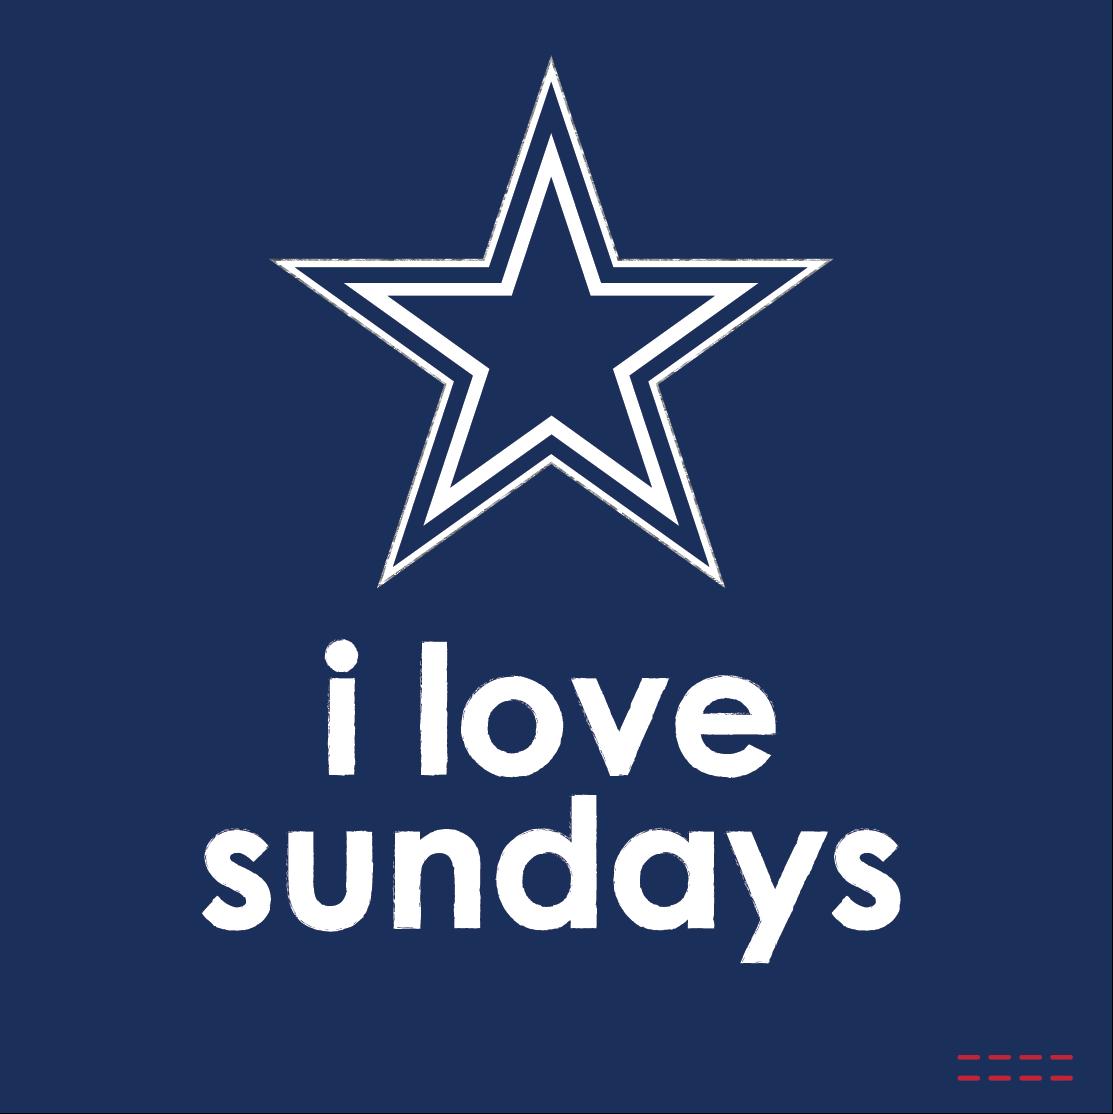 Sunday Night Football Quotes: I Love Sundays Dallas Cowboys